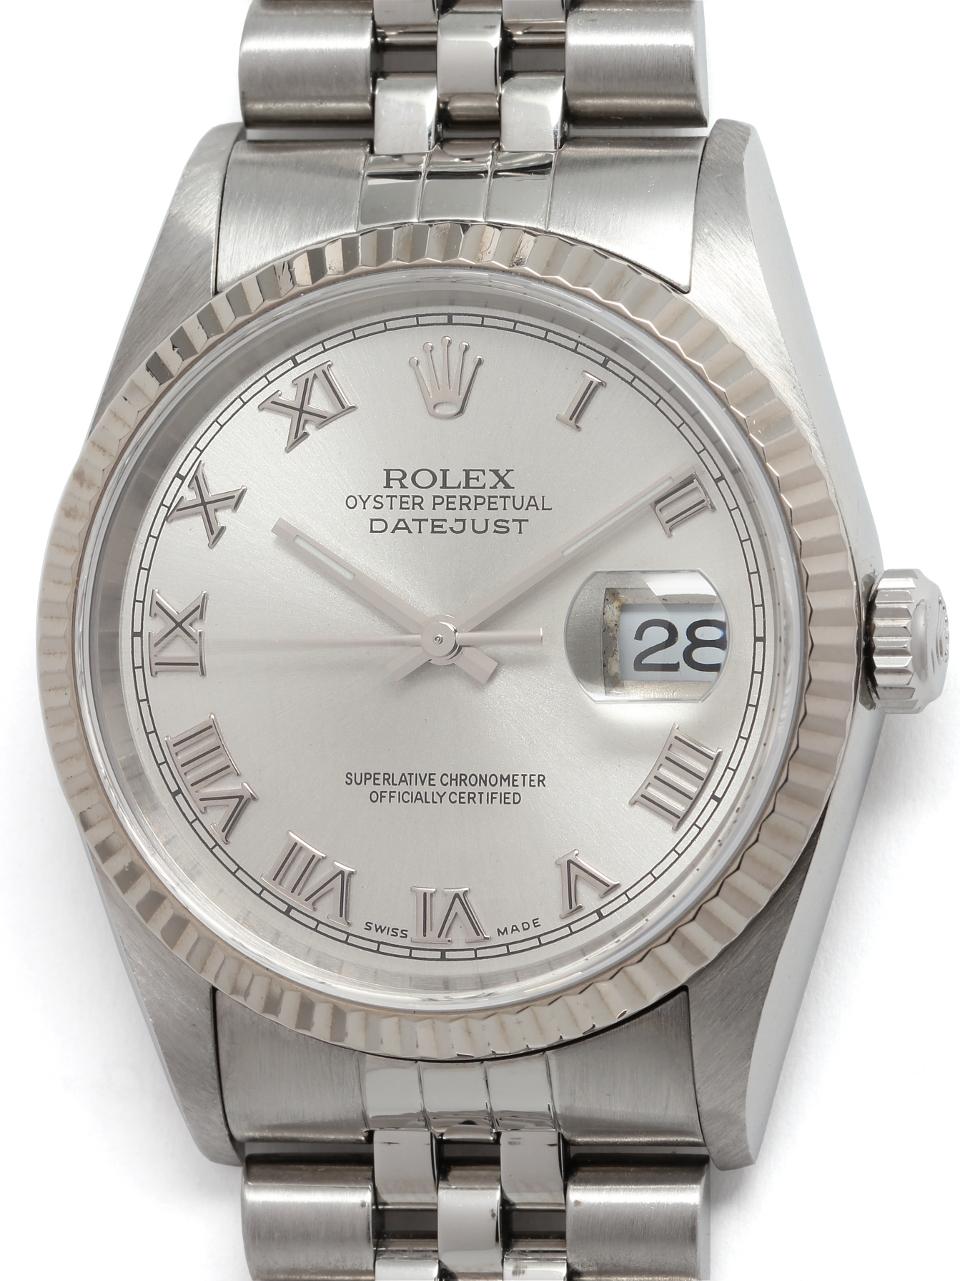 Rolex SS Datejust ref# 16234 circa 2000